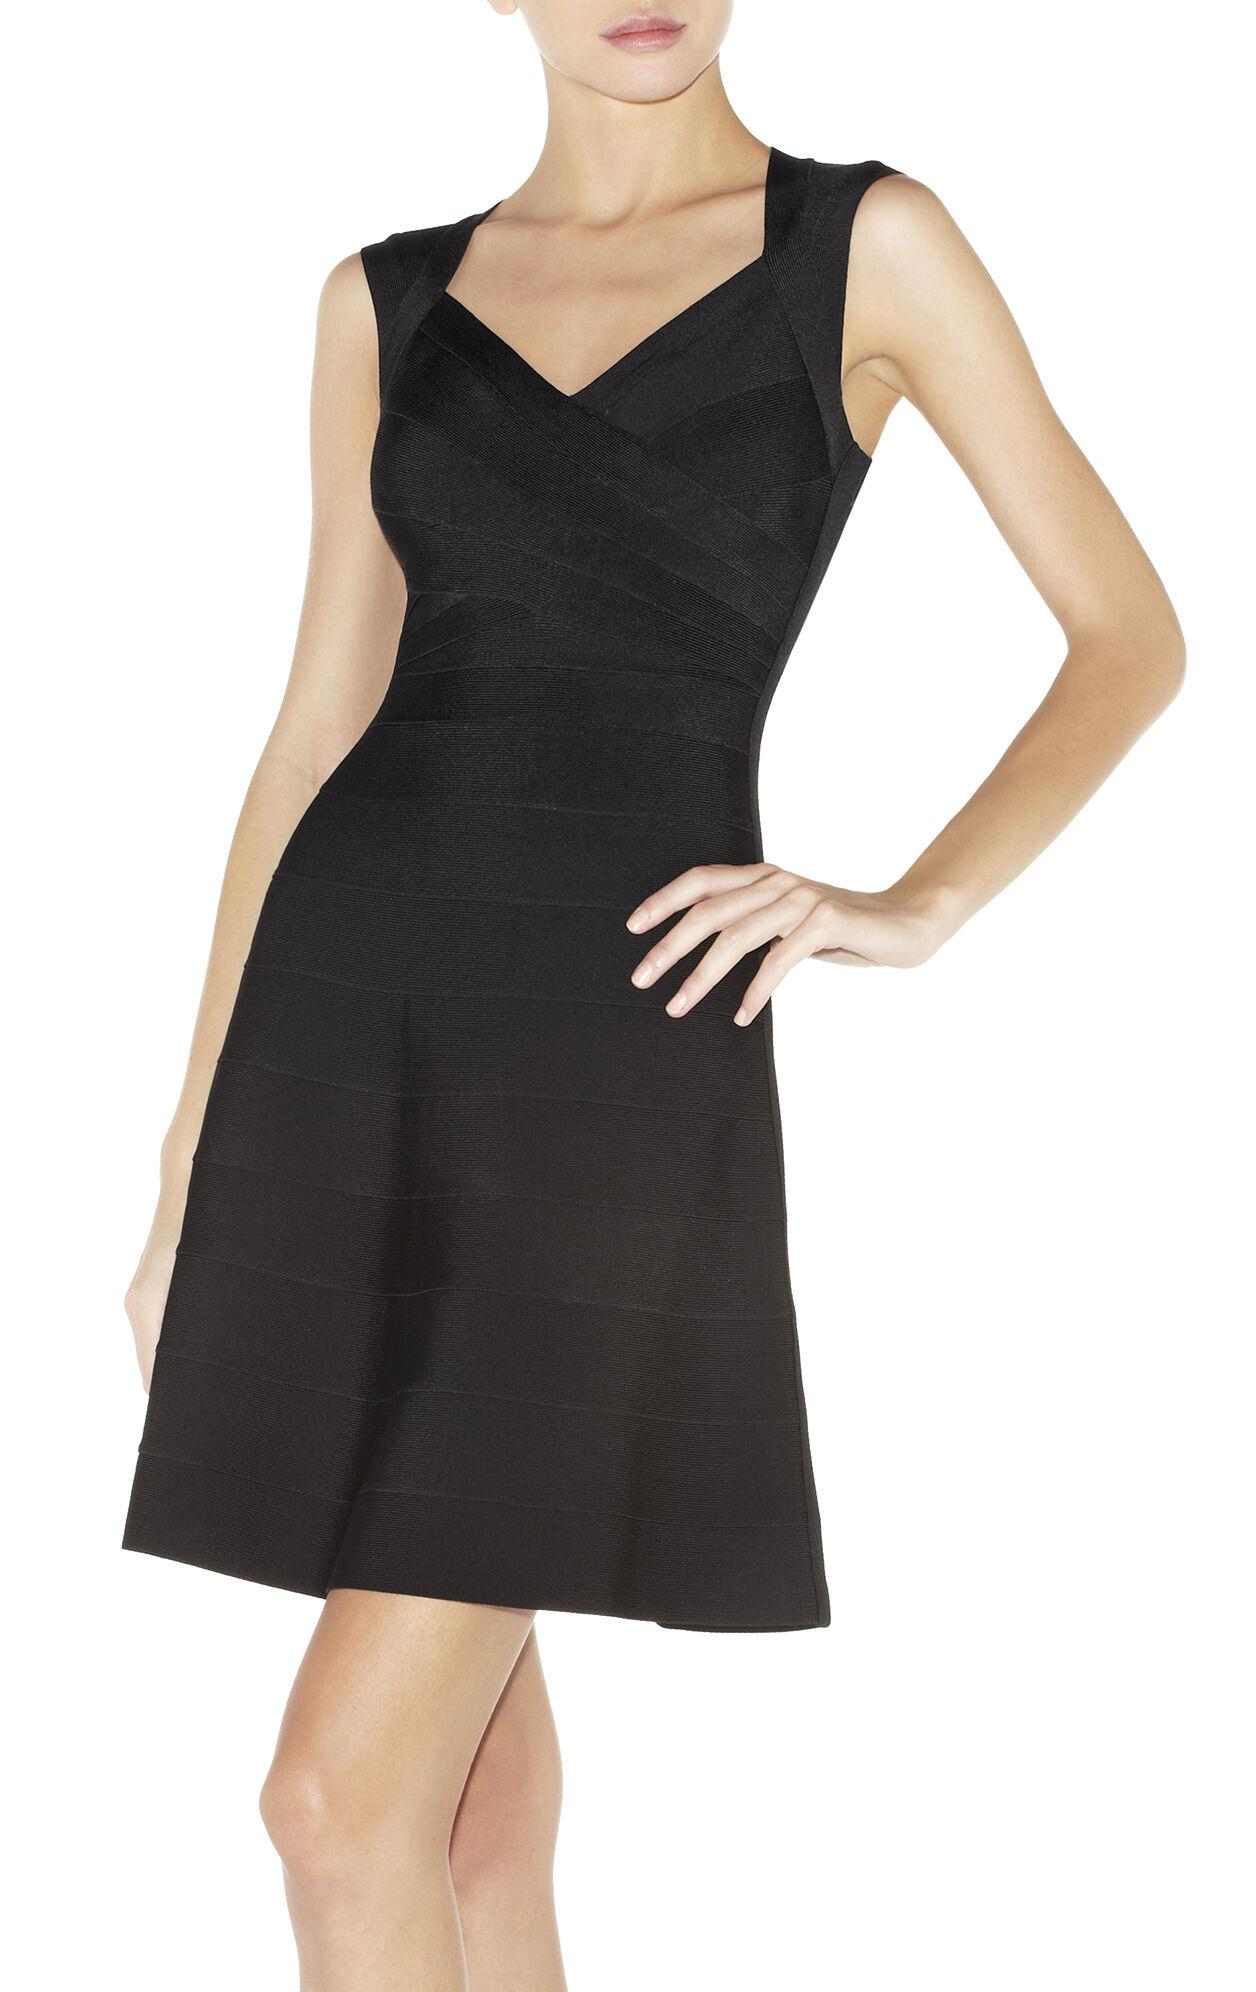 BRUNA A-LINE BANDAGE DRESS